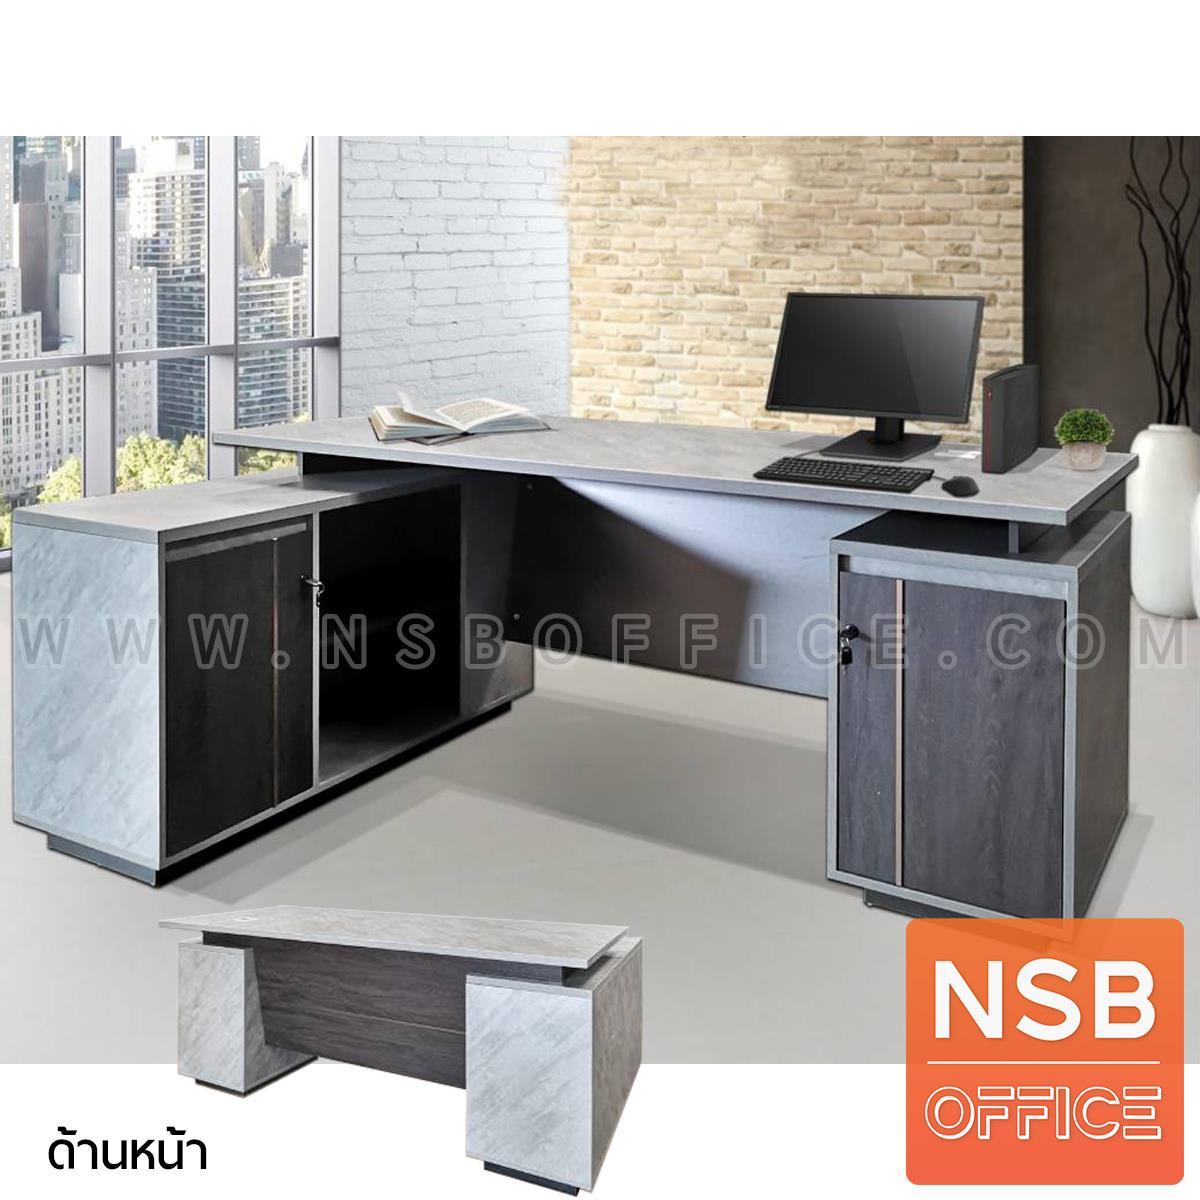 A30A040:โต๊ะทำงานตัวแอล รุ่น Vicky (วิกกี้) ขนาด 180 cm. 2 ลิ้นชัก ตู้ข้างบานเปิดแบบ Soft Close